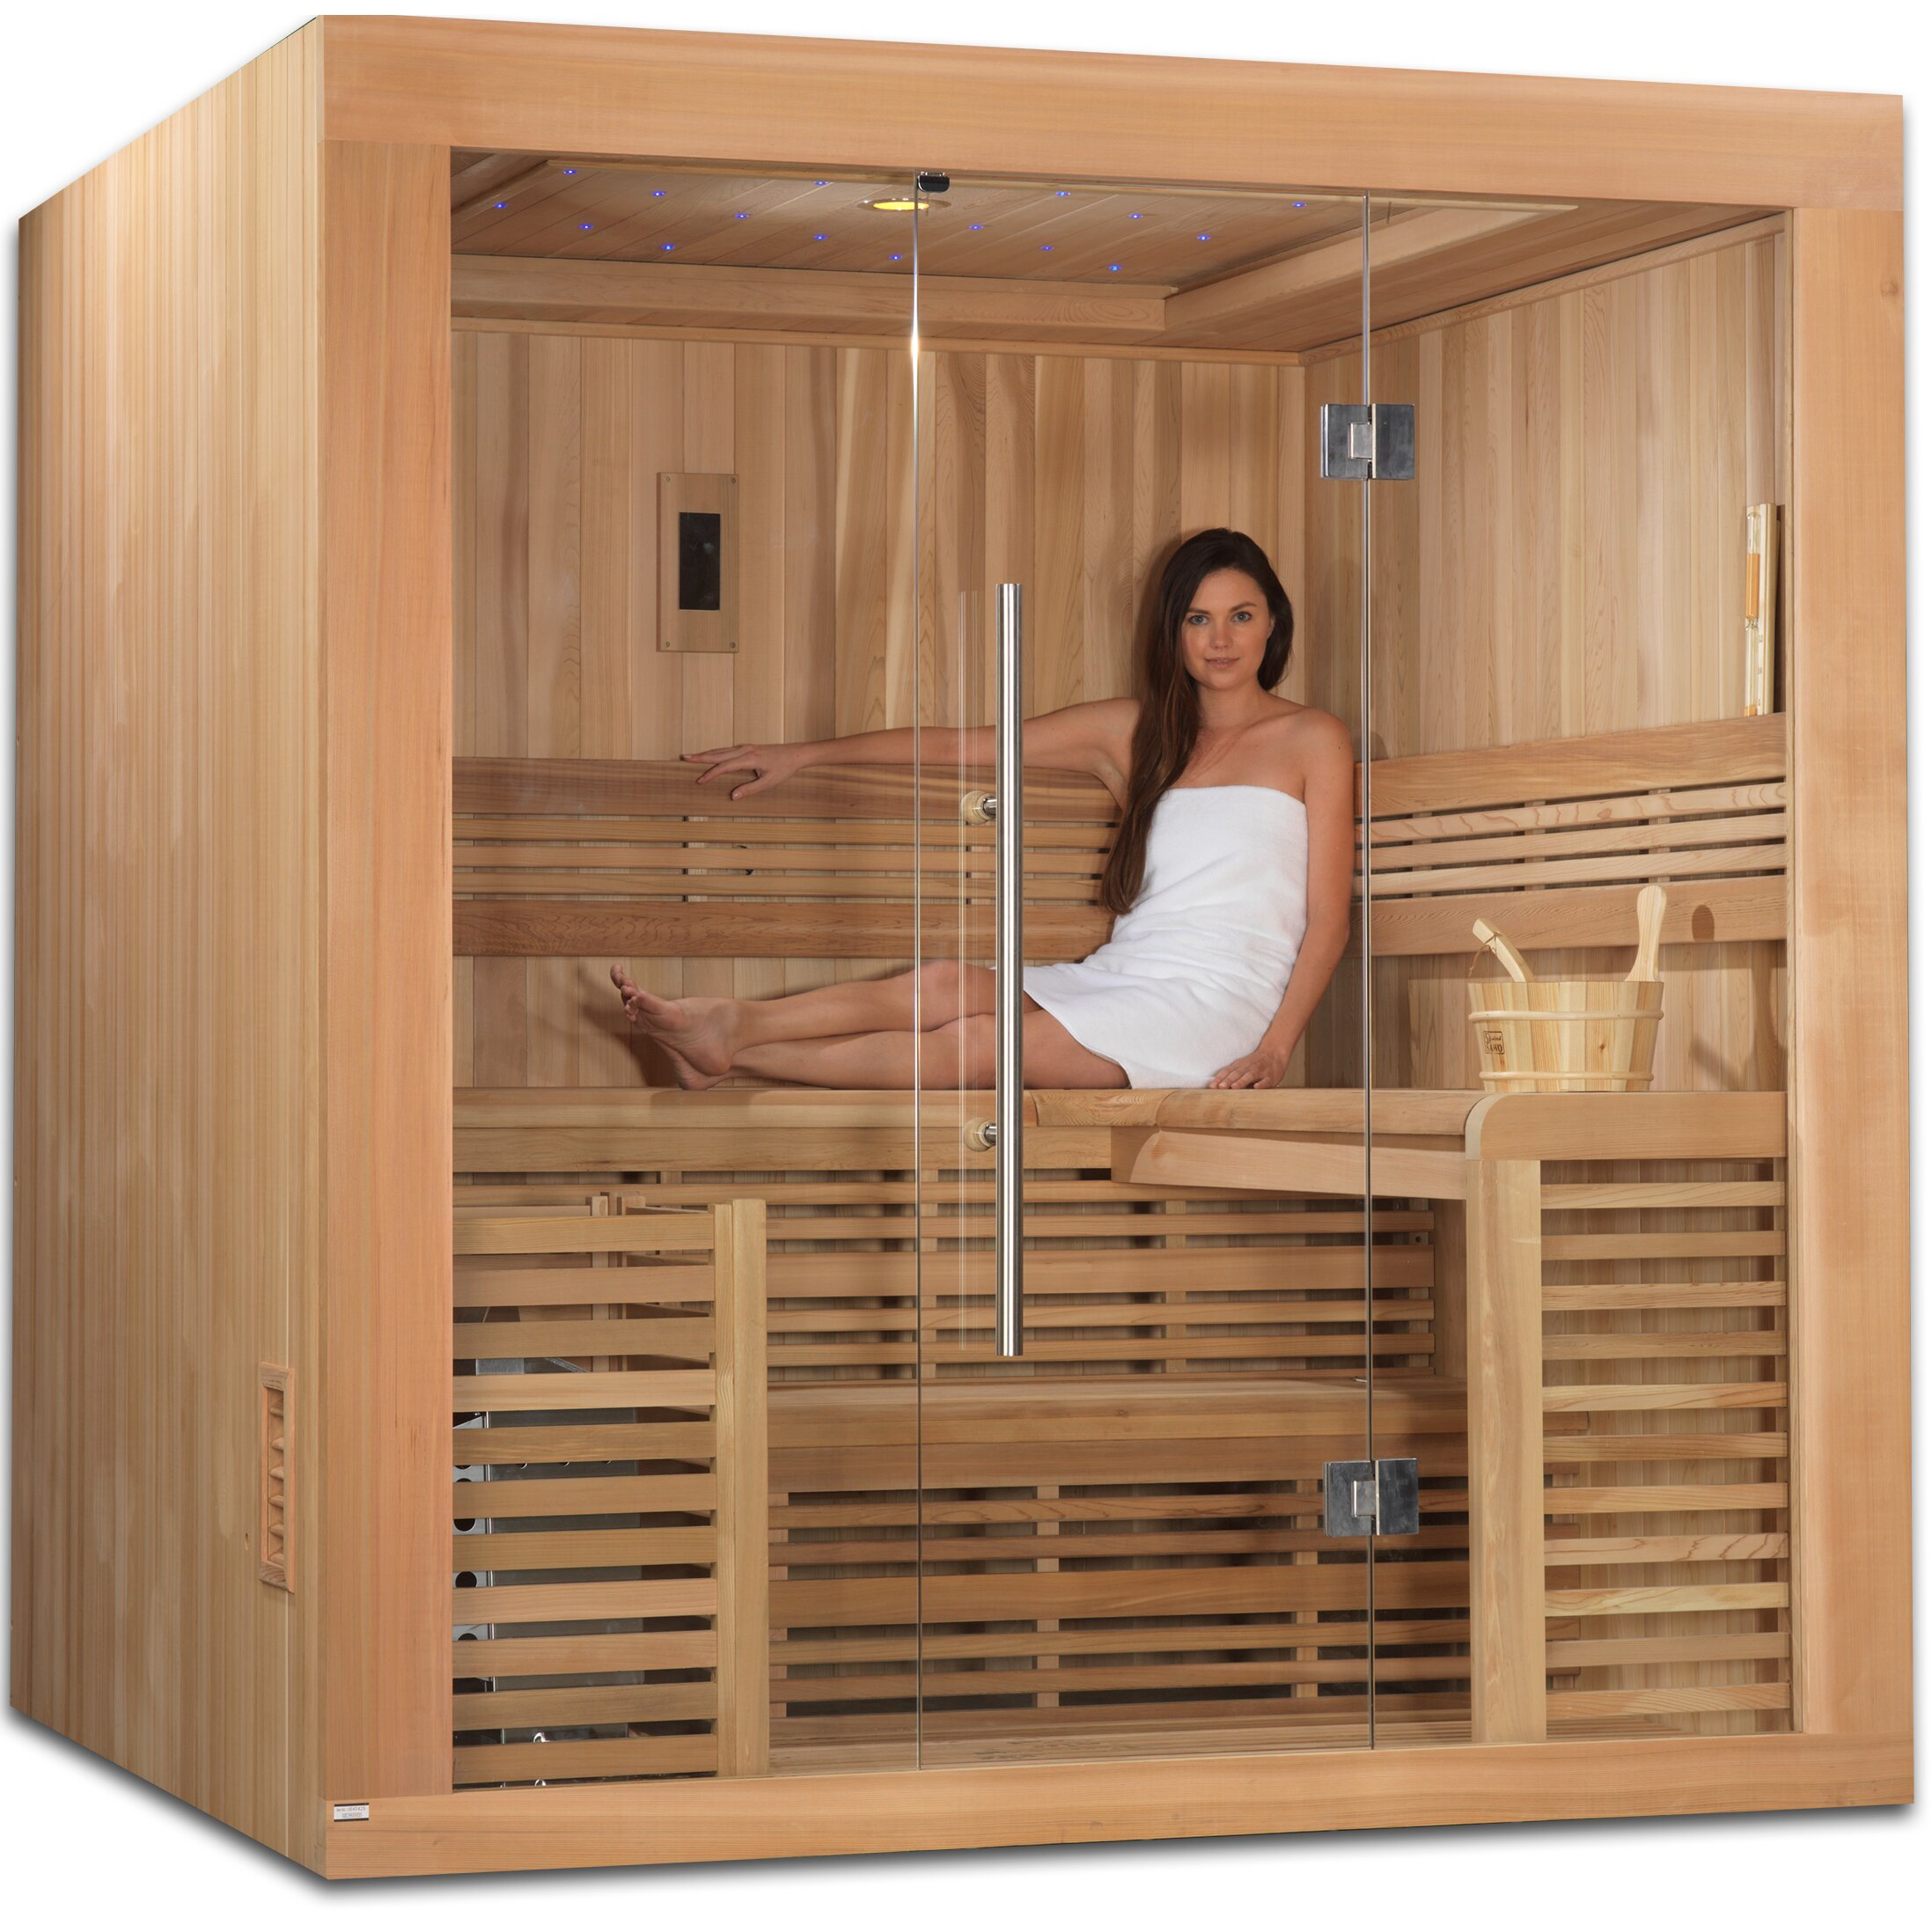 Golden Designs 4 6 Person Ceramic Far Infrared Sauna Wayfair